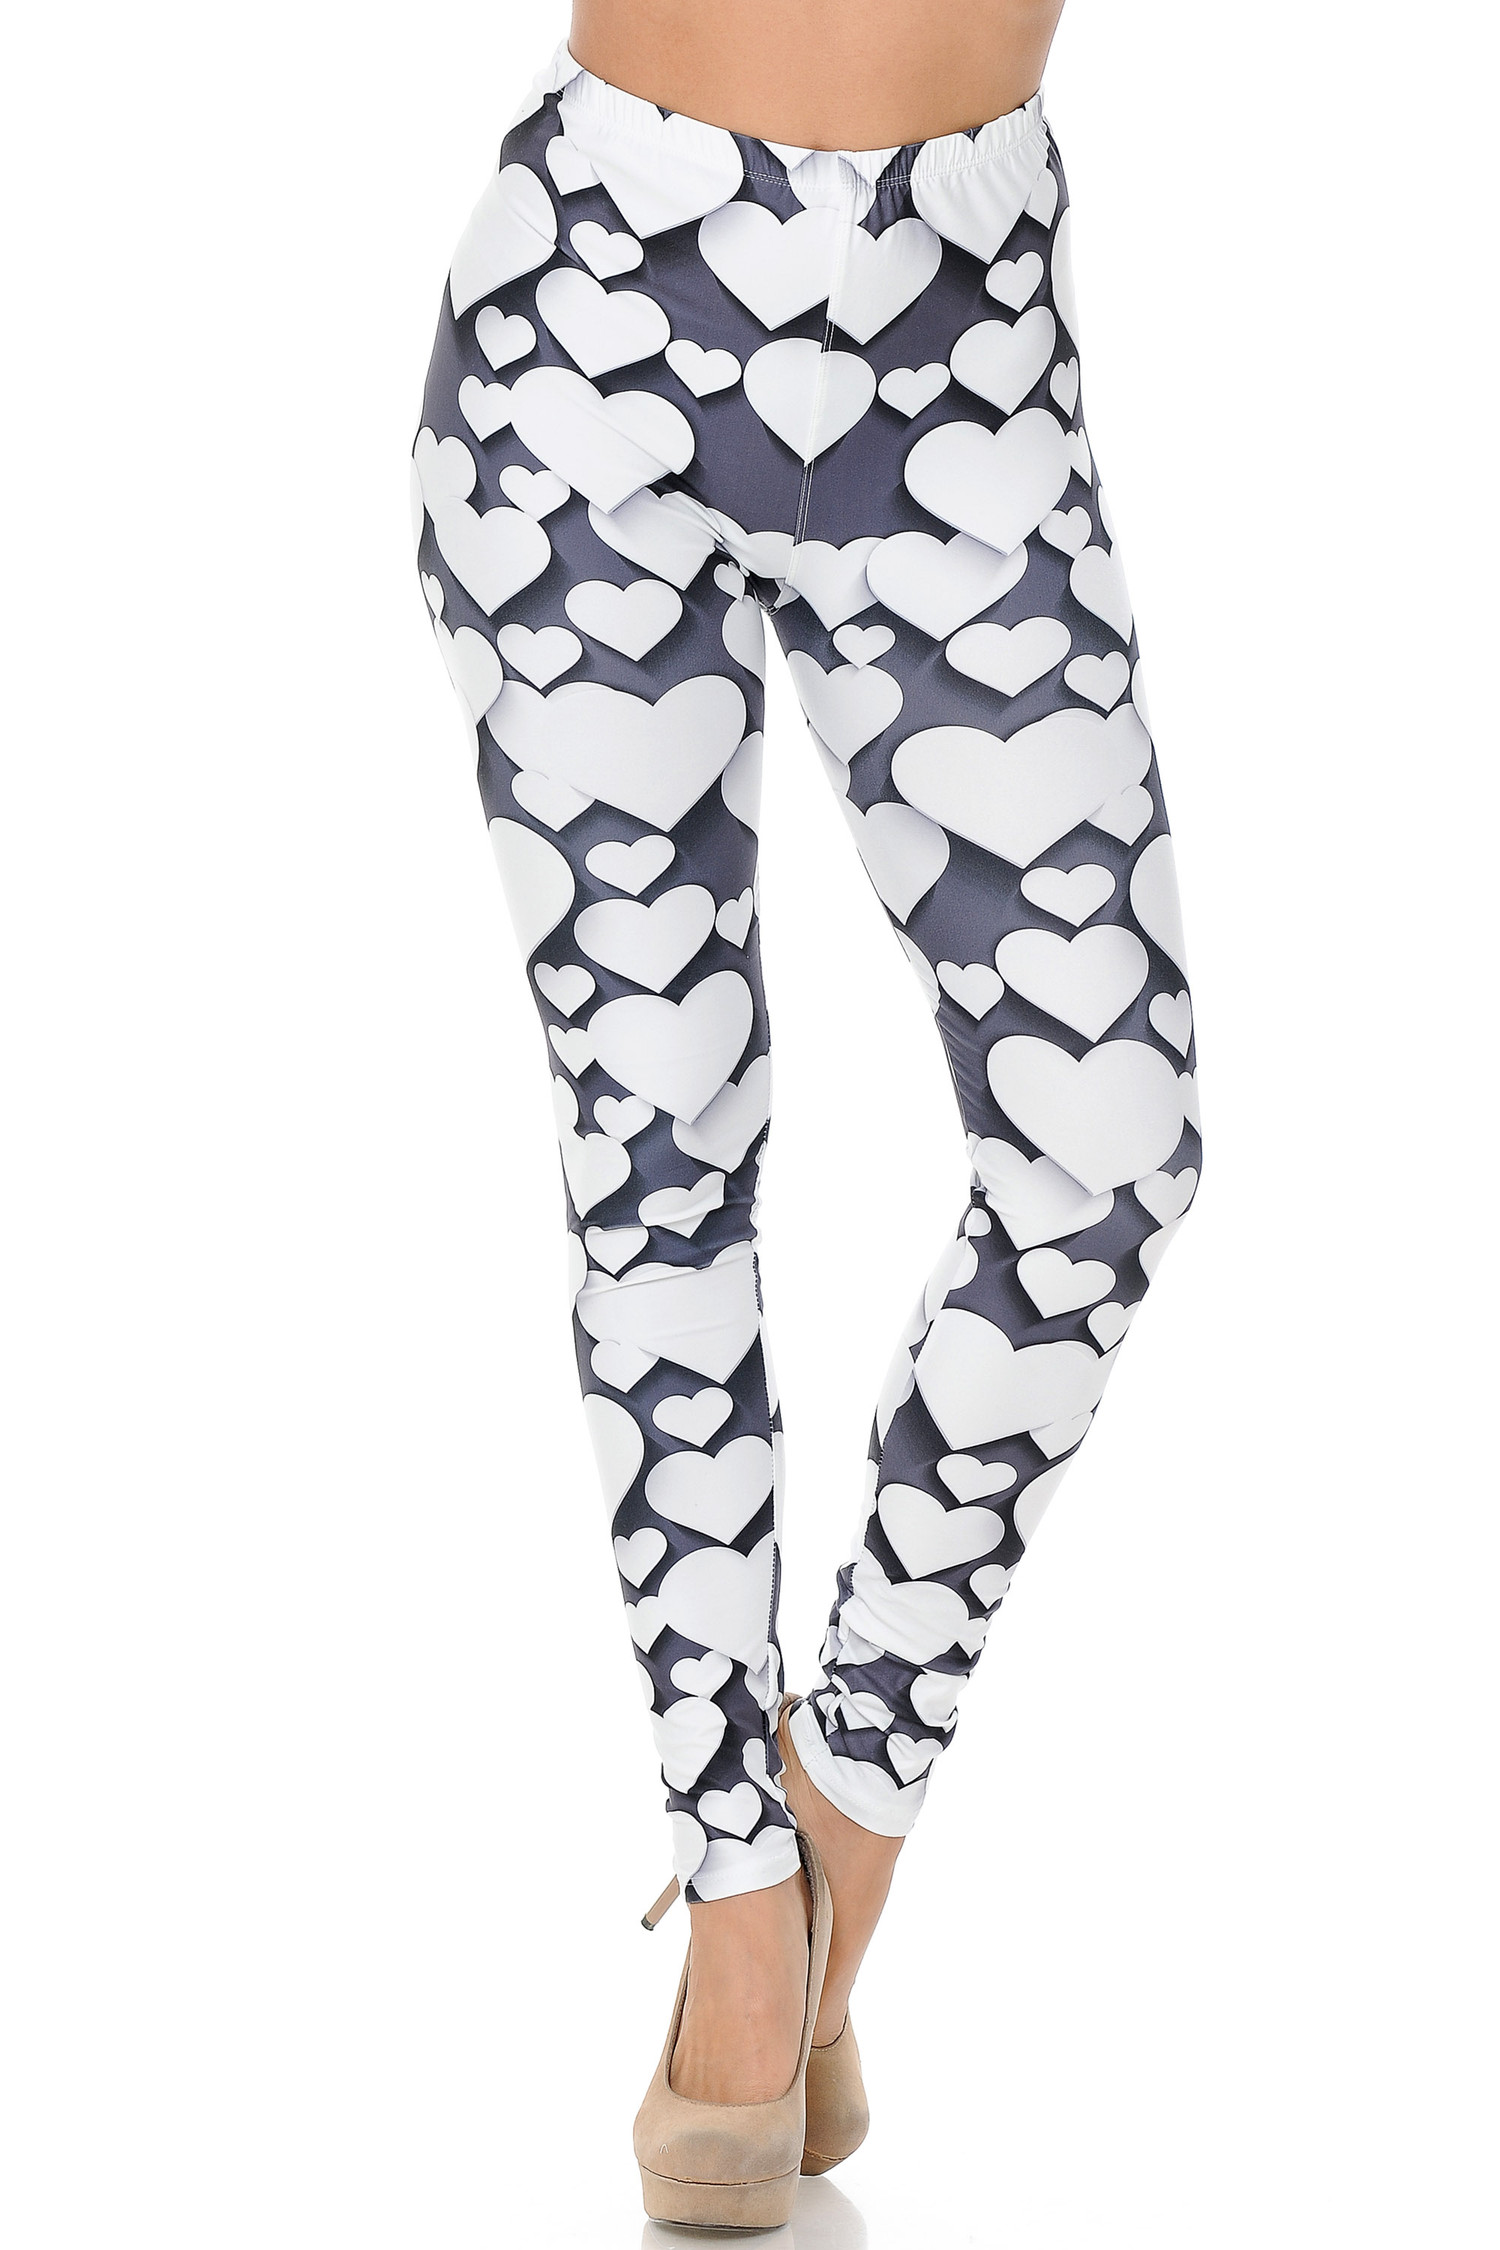 Creamy Soft 3D Hearts Leggings